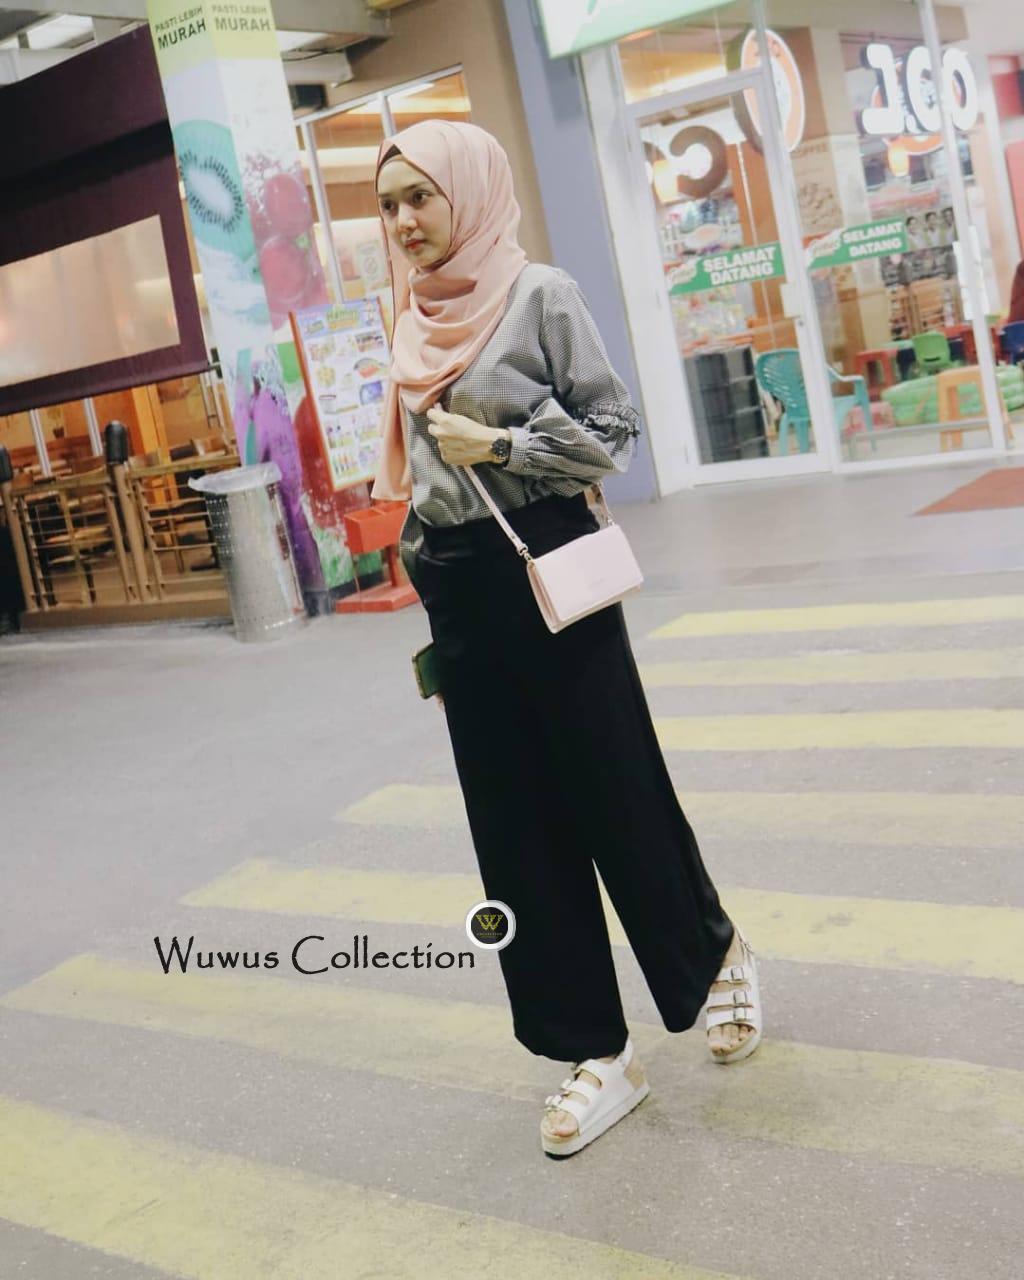 Buy Sell Cheapest Panjang Tao Crepe Best Quality Product Deals Celana Kulot Crep Millano Wuwusgrosir Bahan Tebal Hitam Trendy